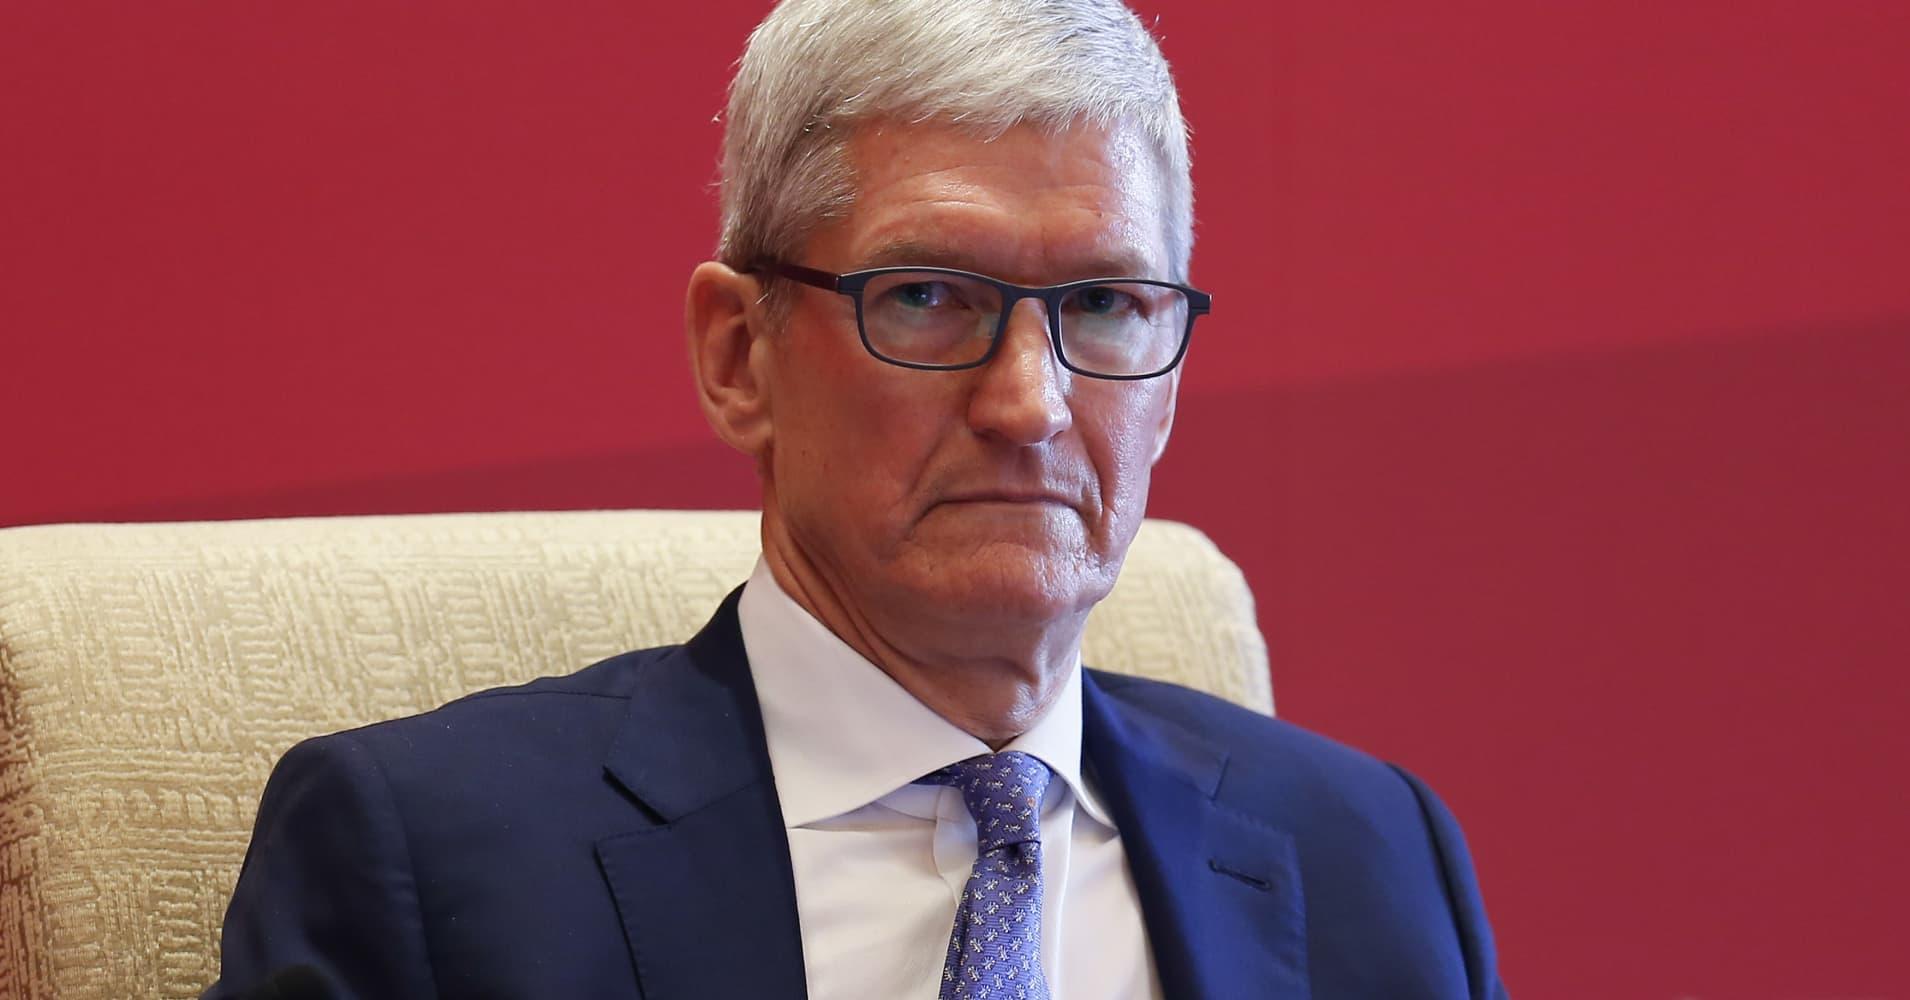 Apple is preparing for a $7 billion court battle with Qualcomm, not in settlement talks